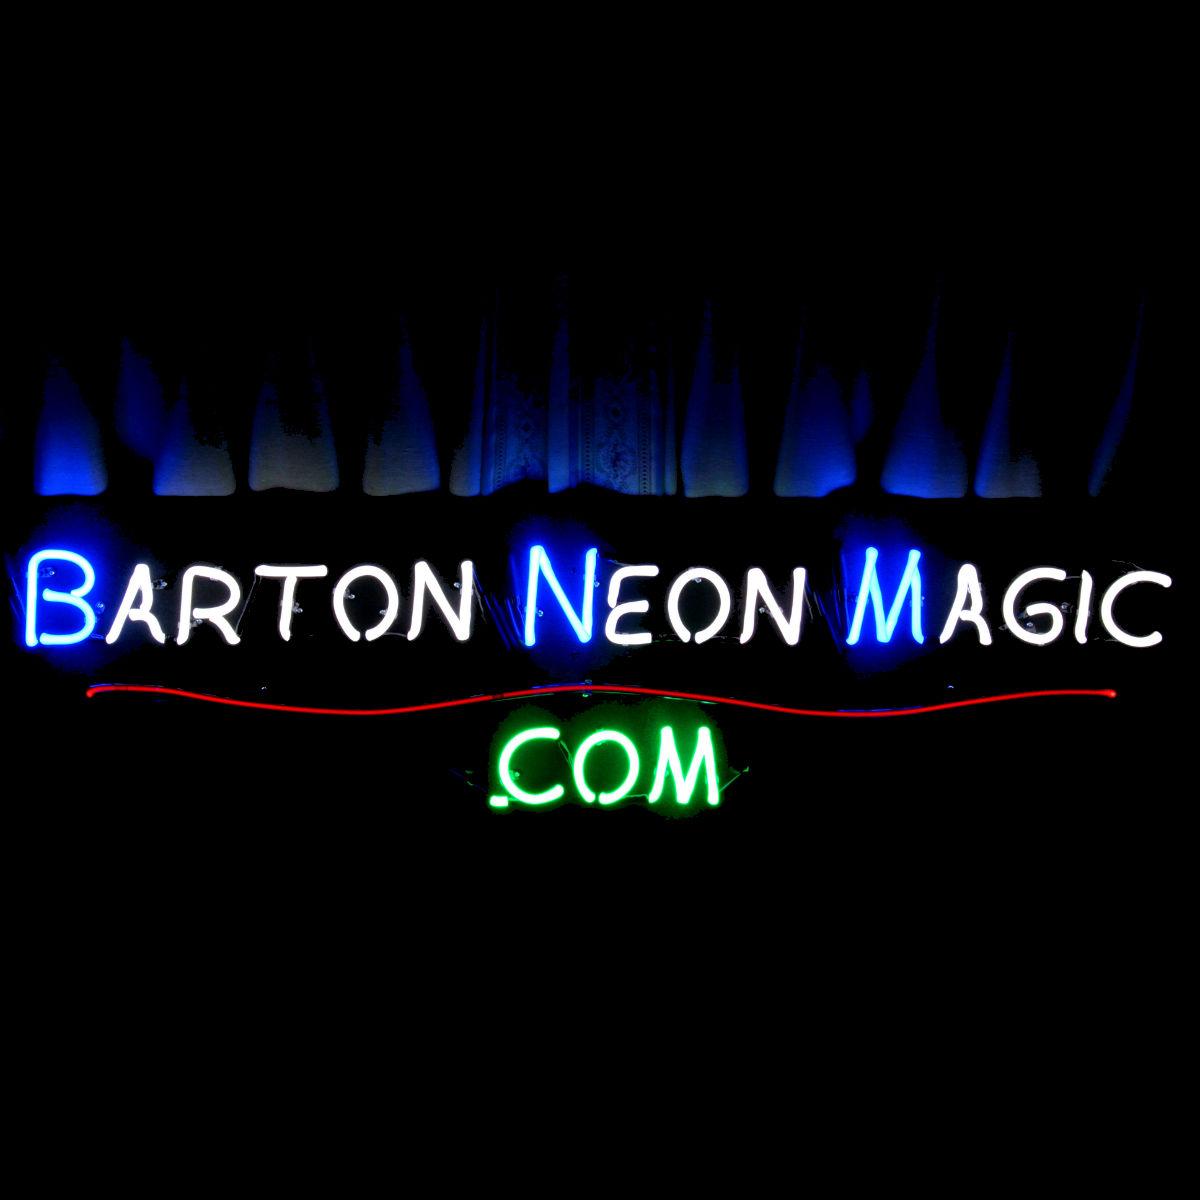 BartonNeonMagic.com - Fine Quality Custom Neon Lighting by John Barton